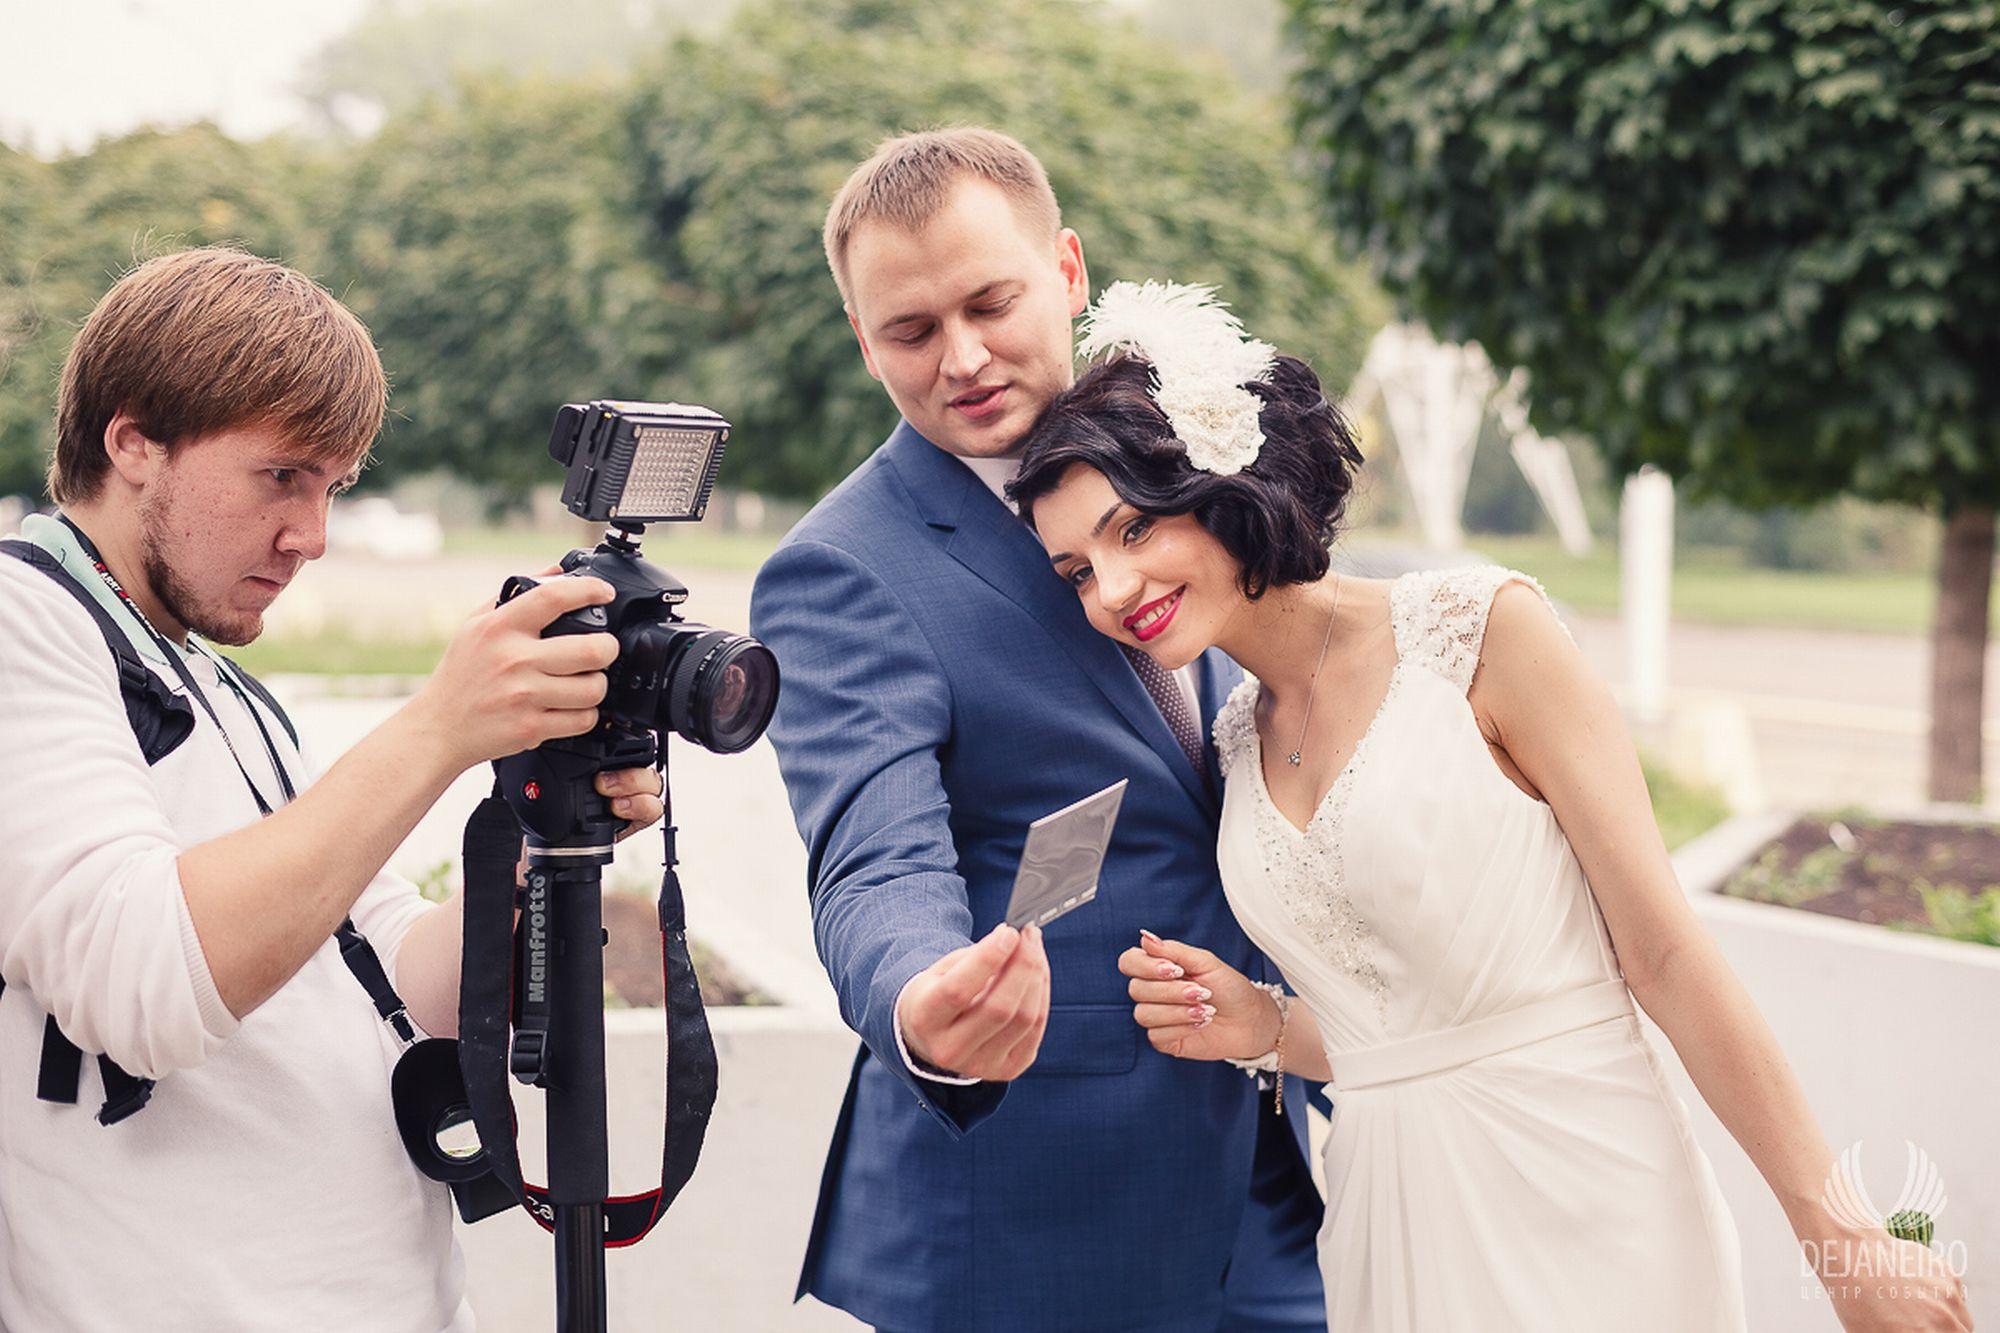 Алсу свадьба фото со свадьбы